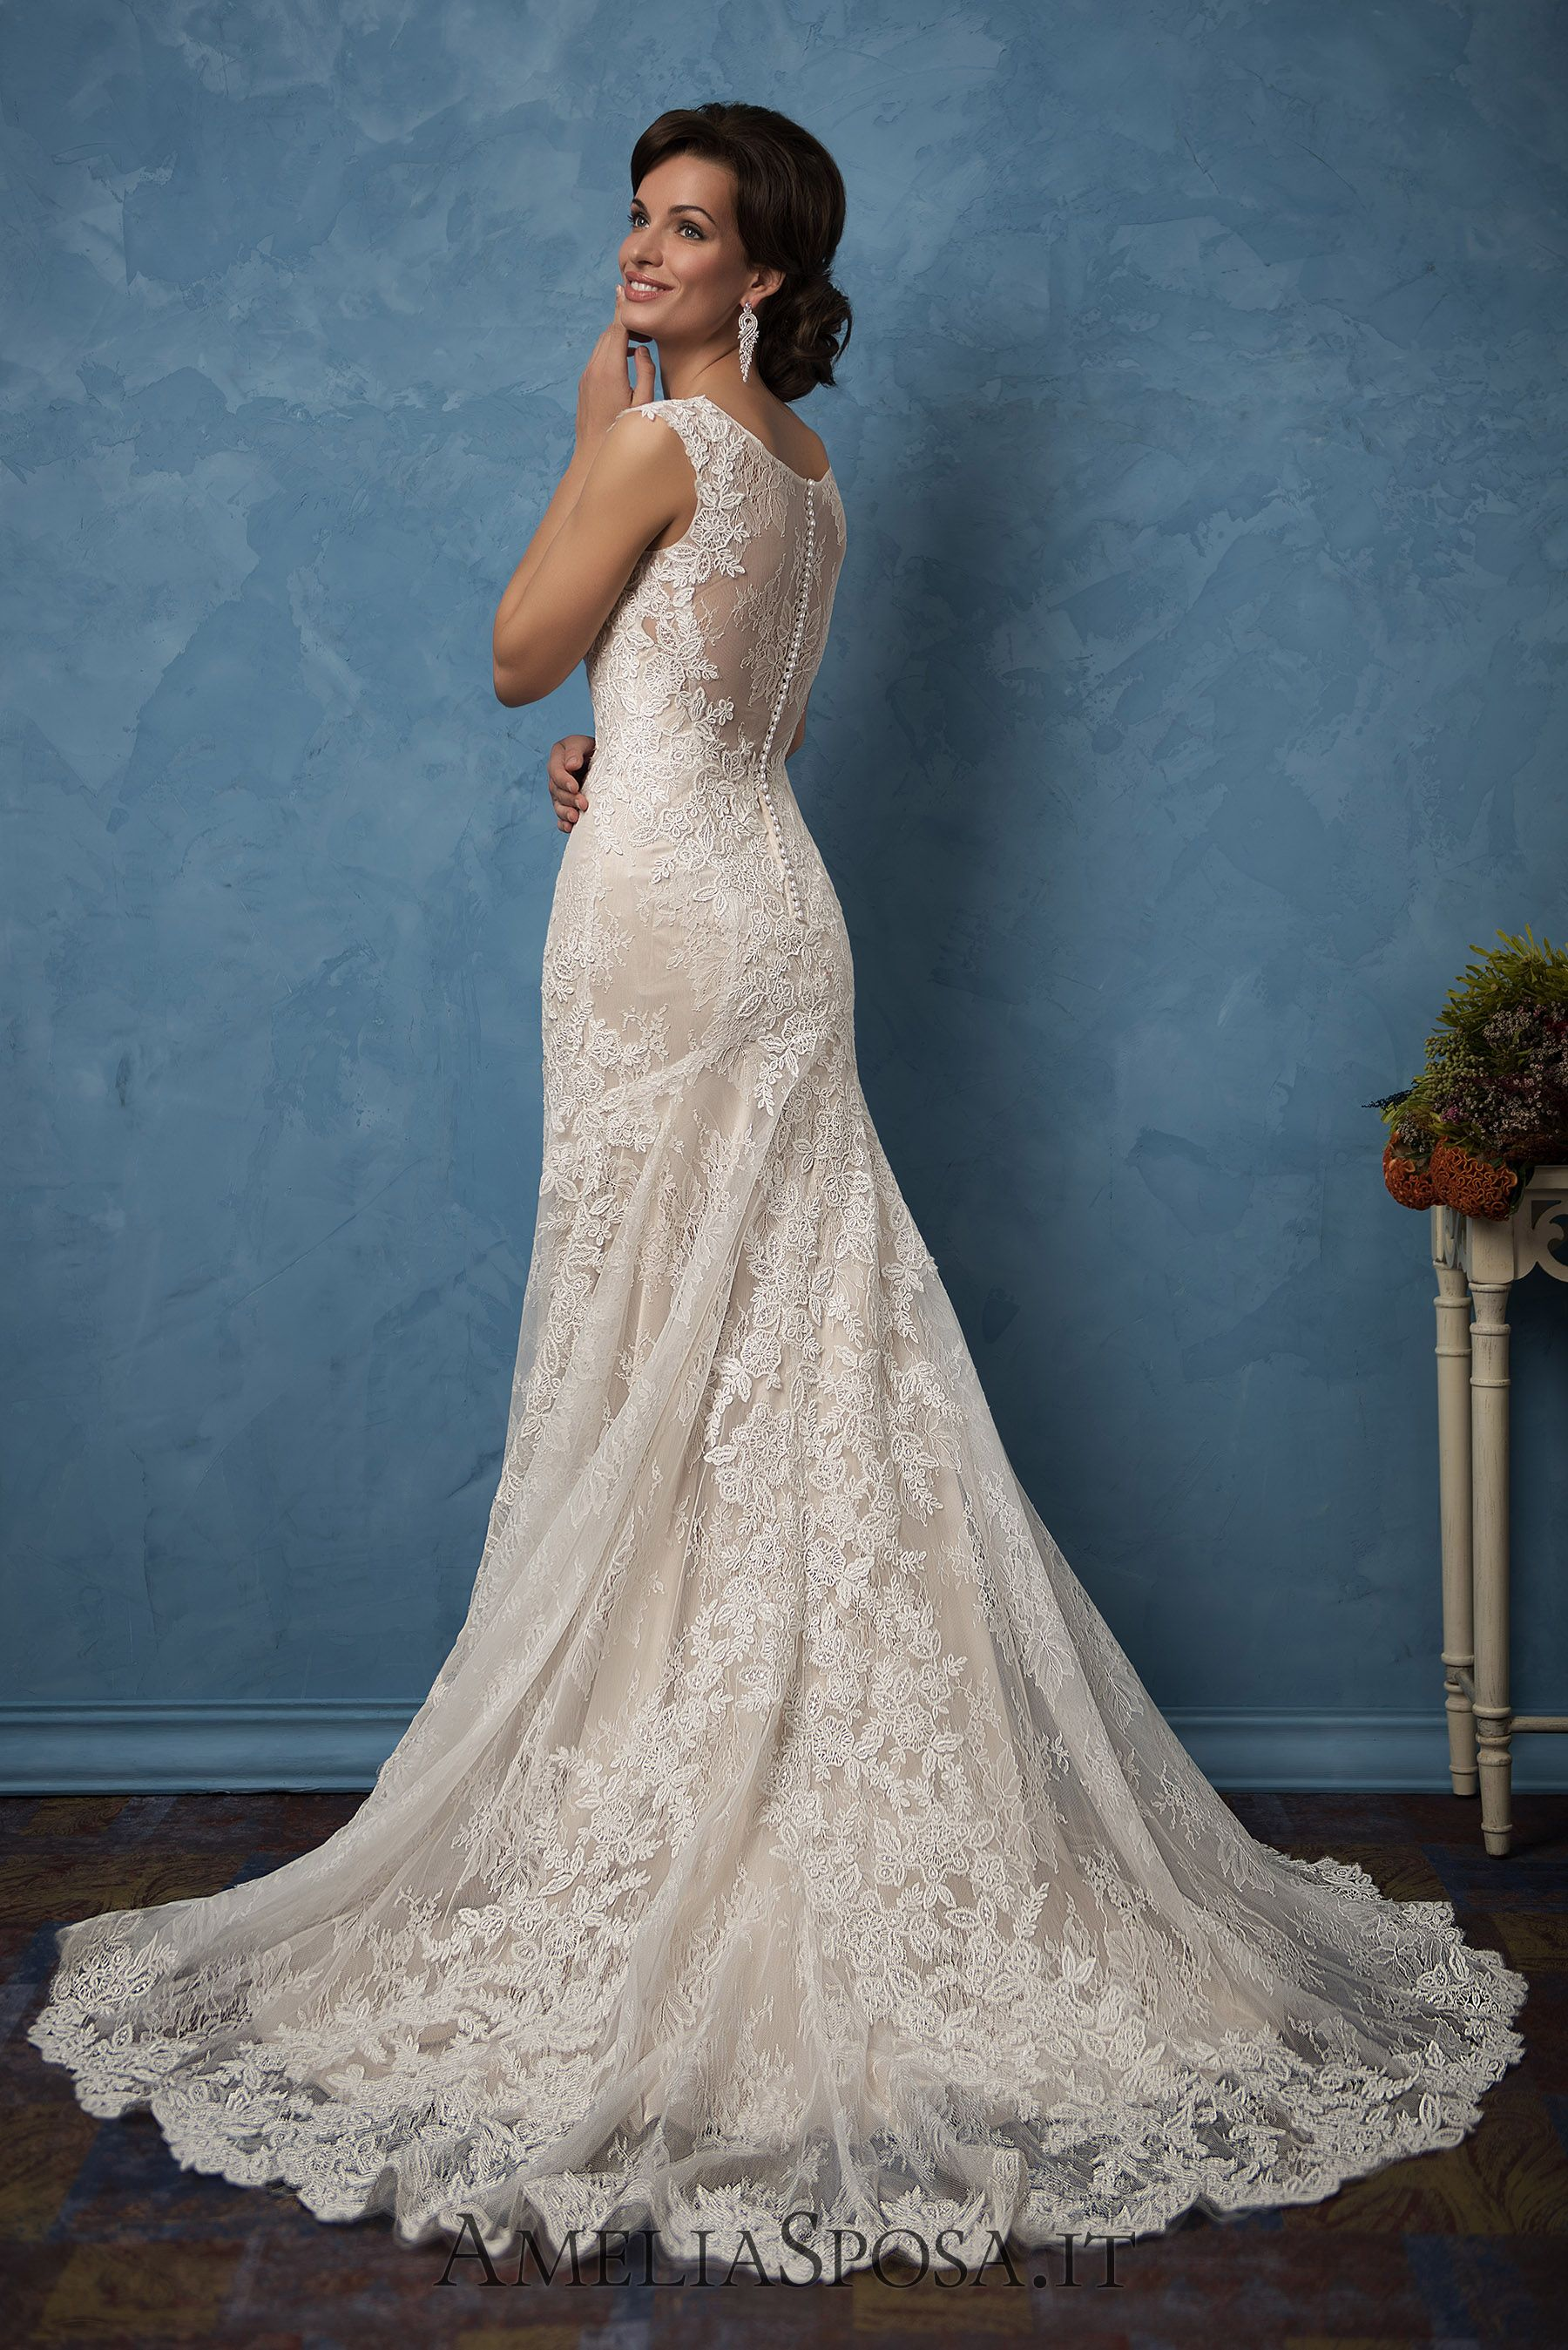 Wedding dress adriana silhouette sheath mermaid bridal styles